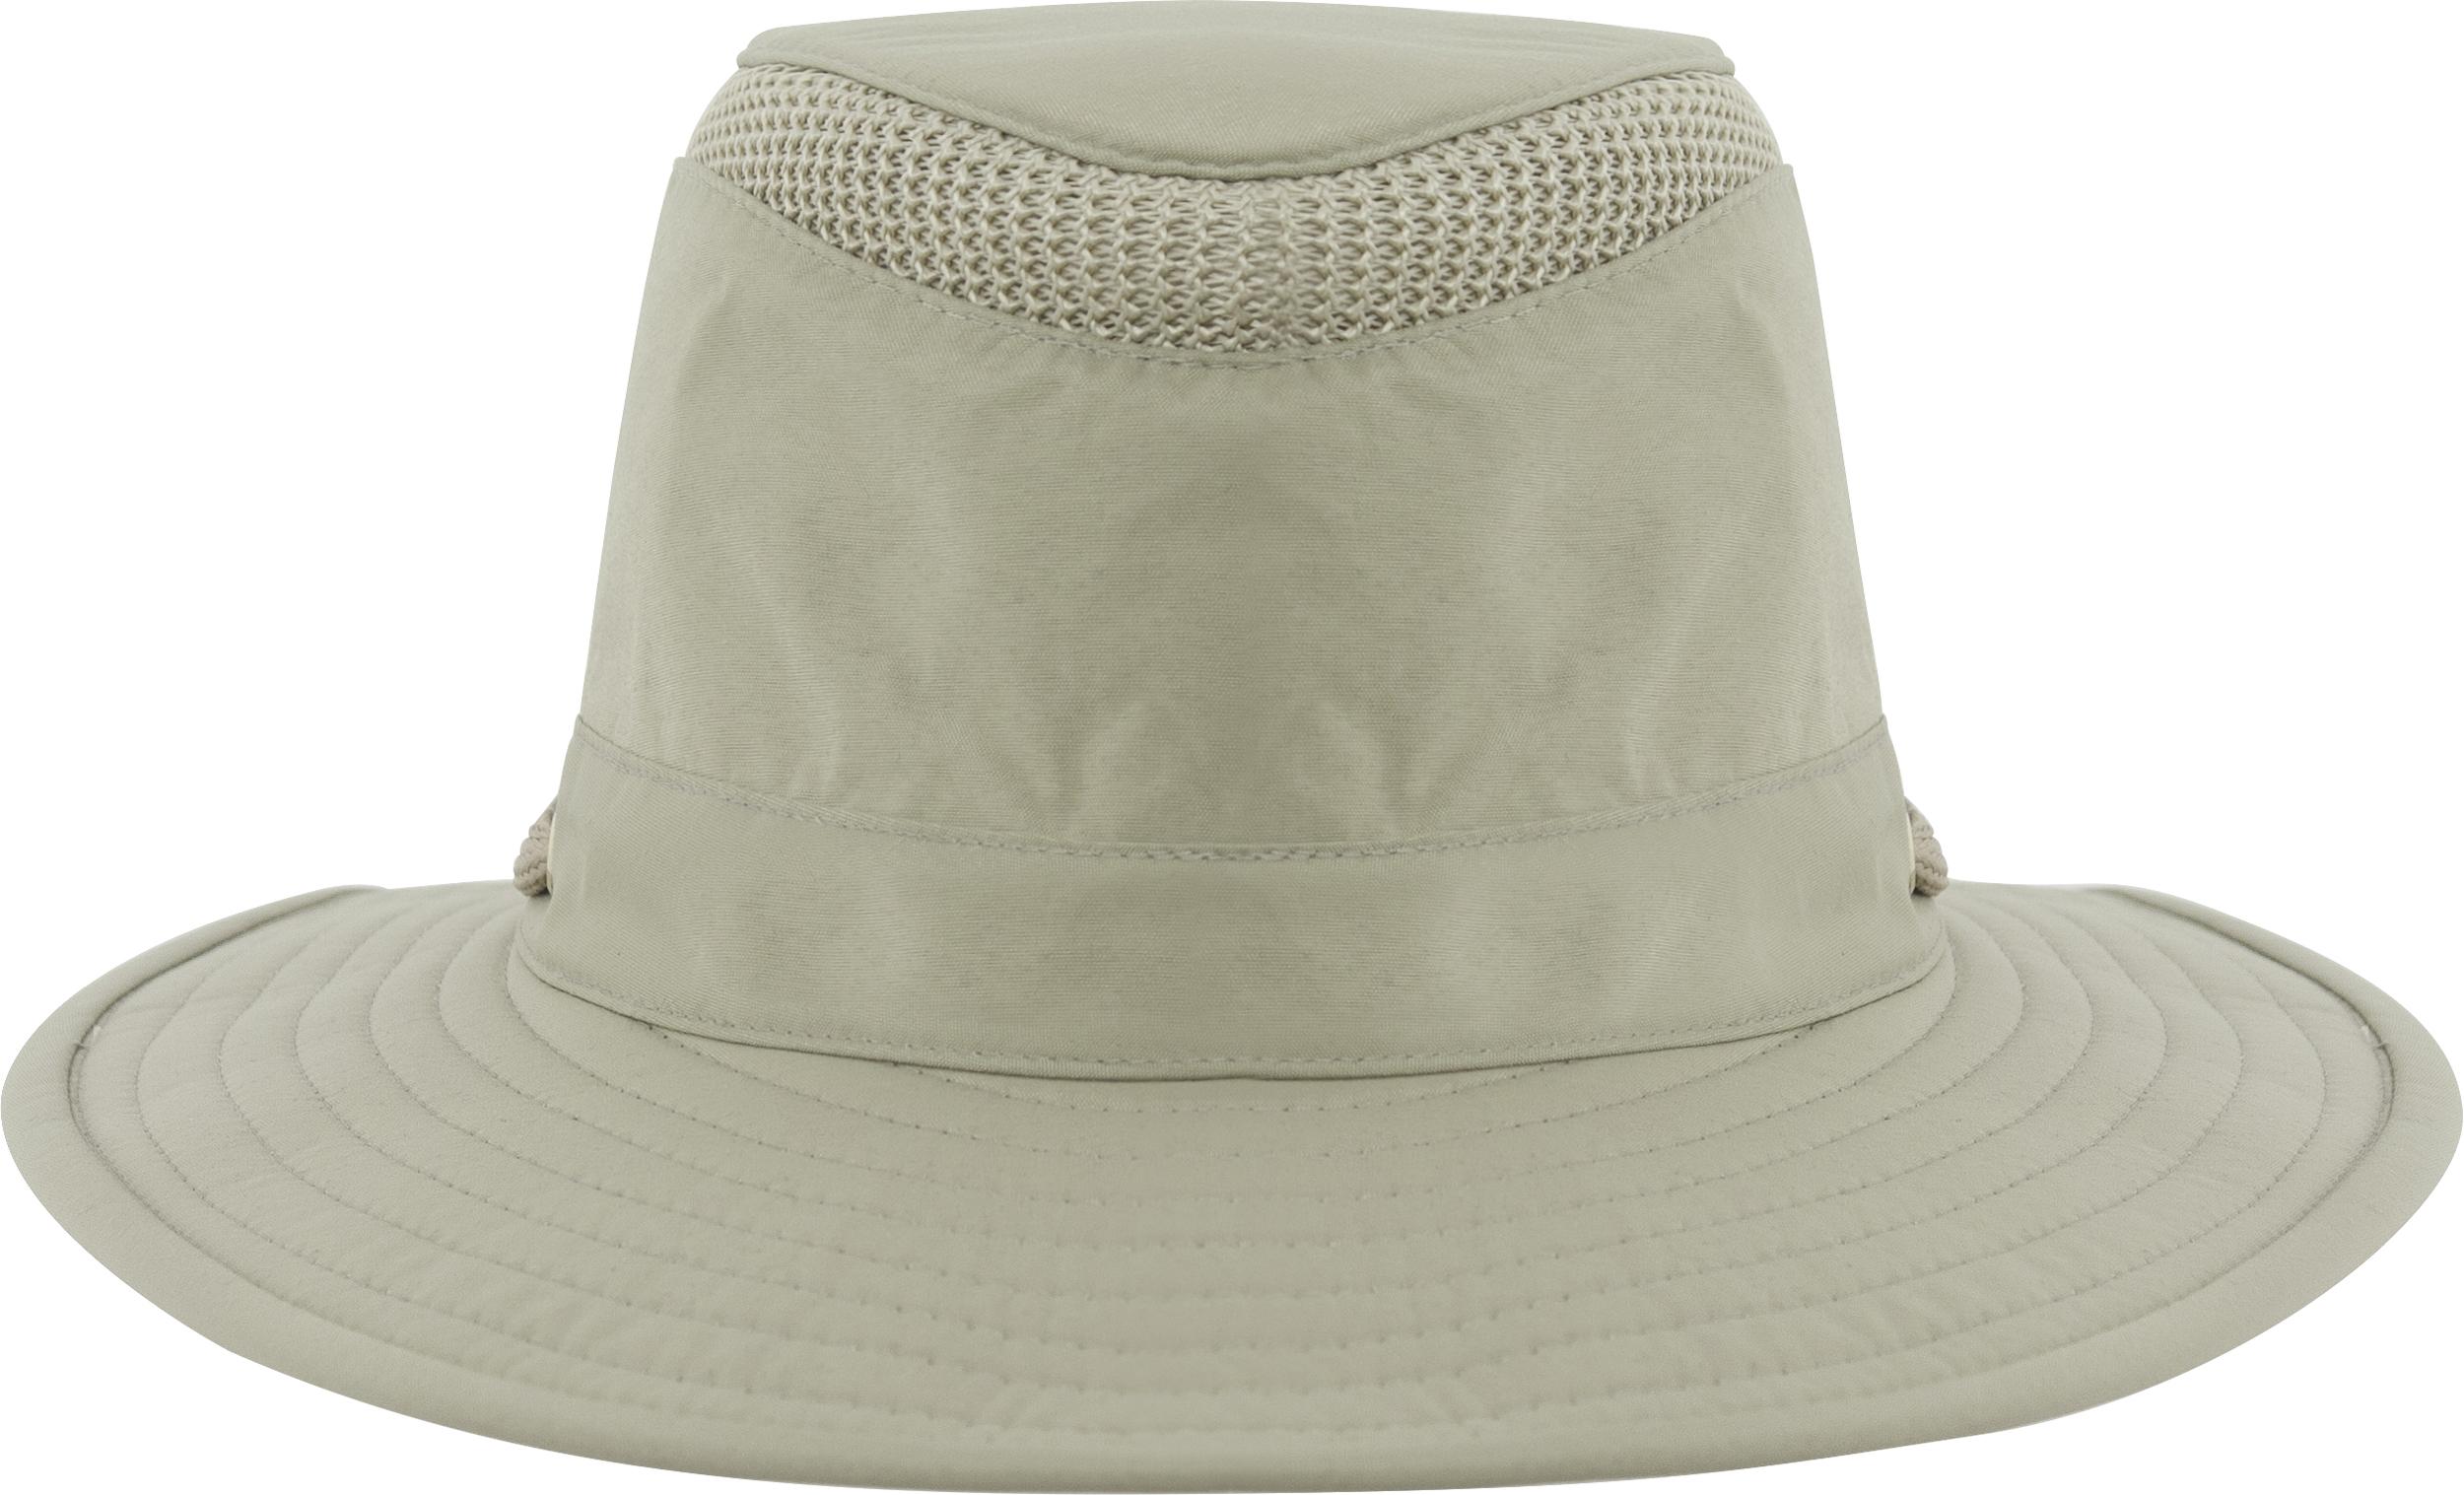 0928c501aebba Tilley Endurables LTM6 Airflo Hat - Unisex